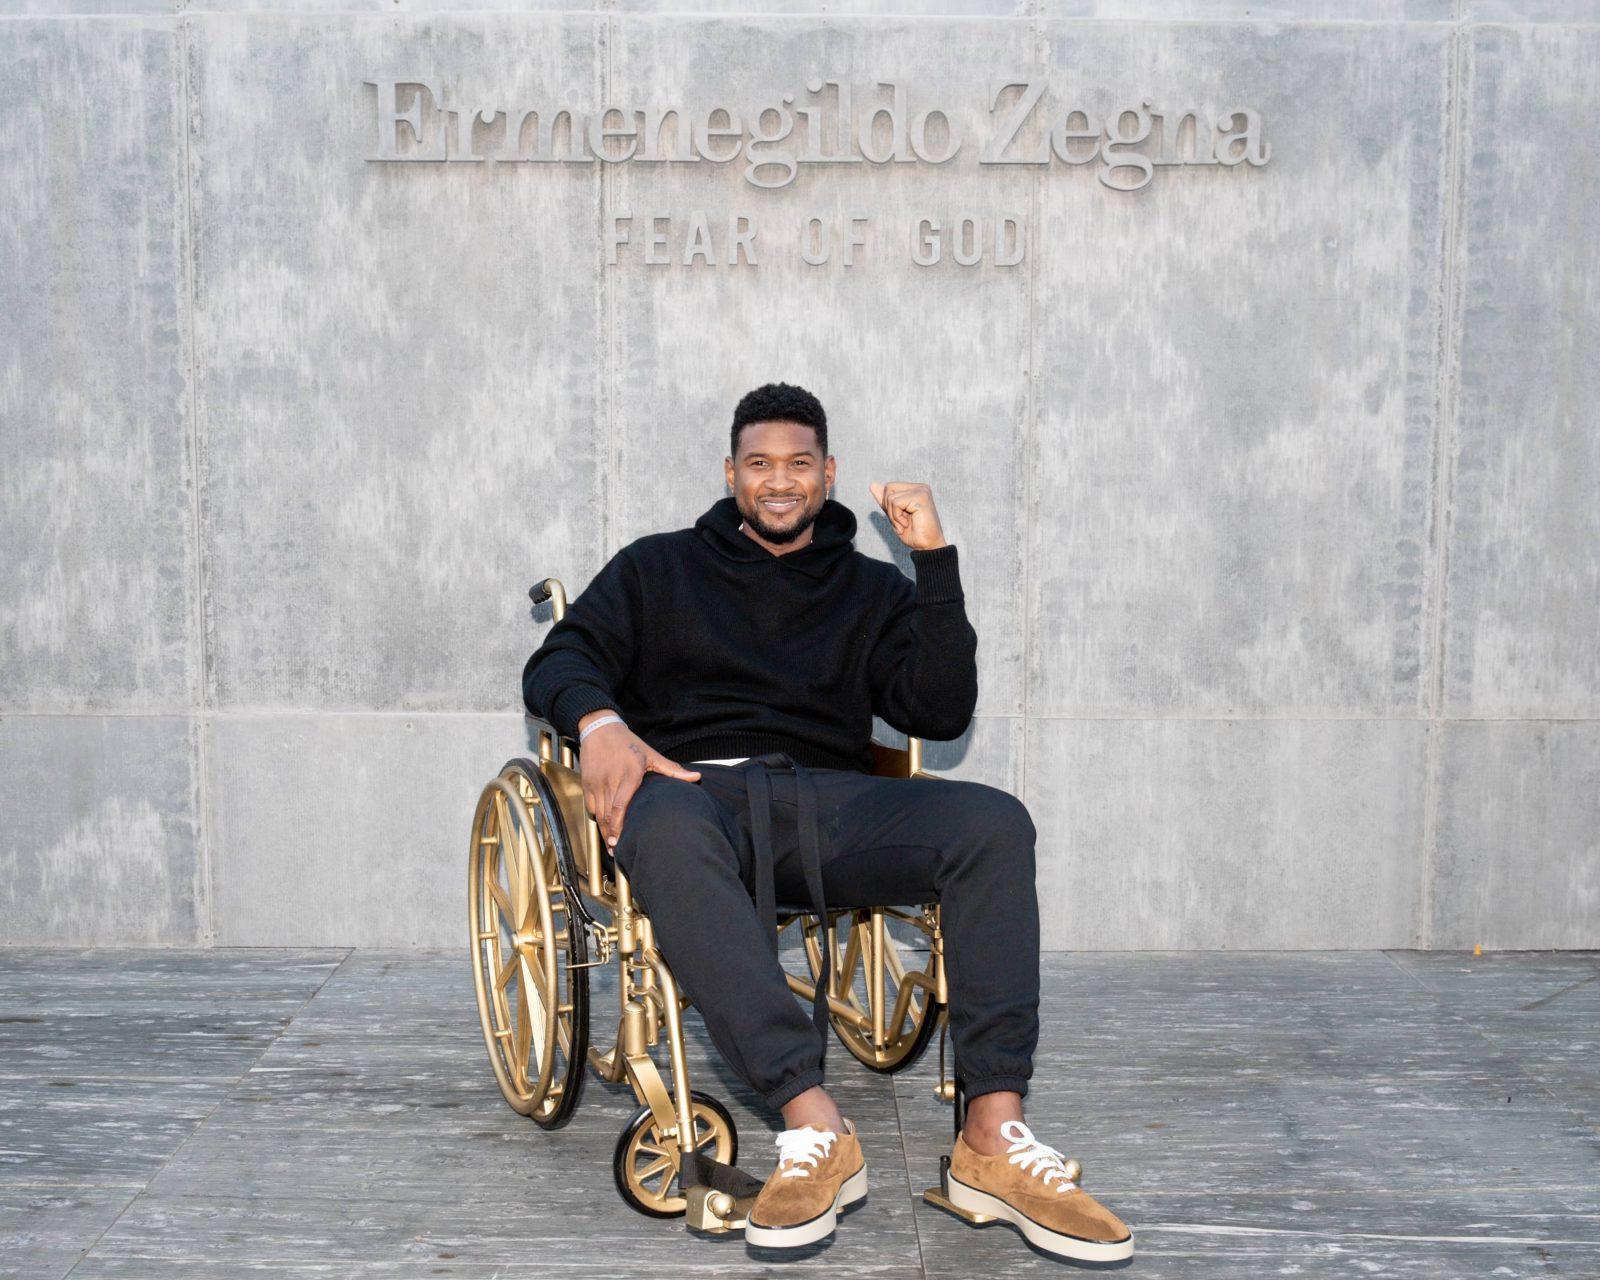 Usher x fear of god x zegna